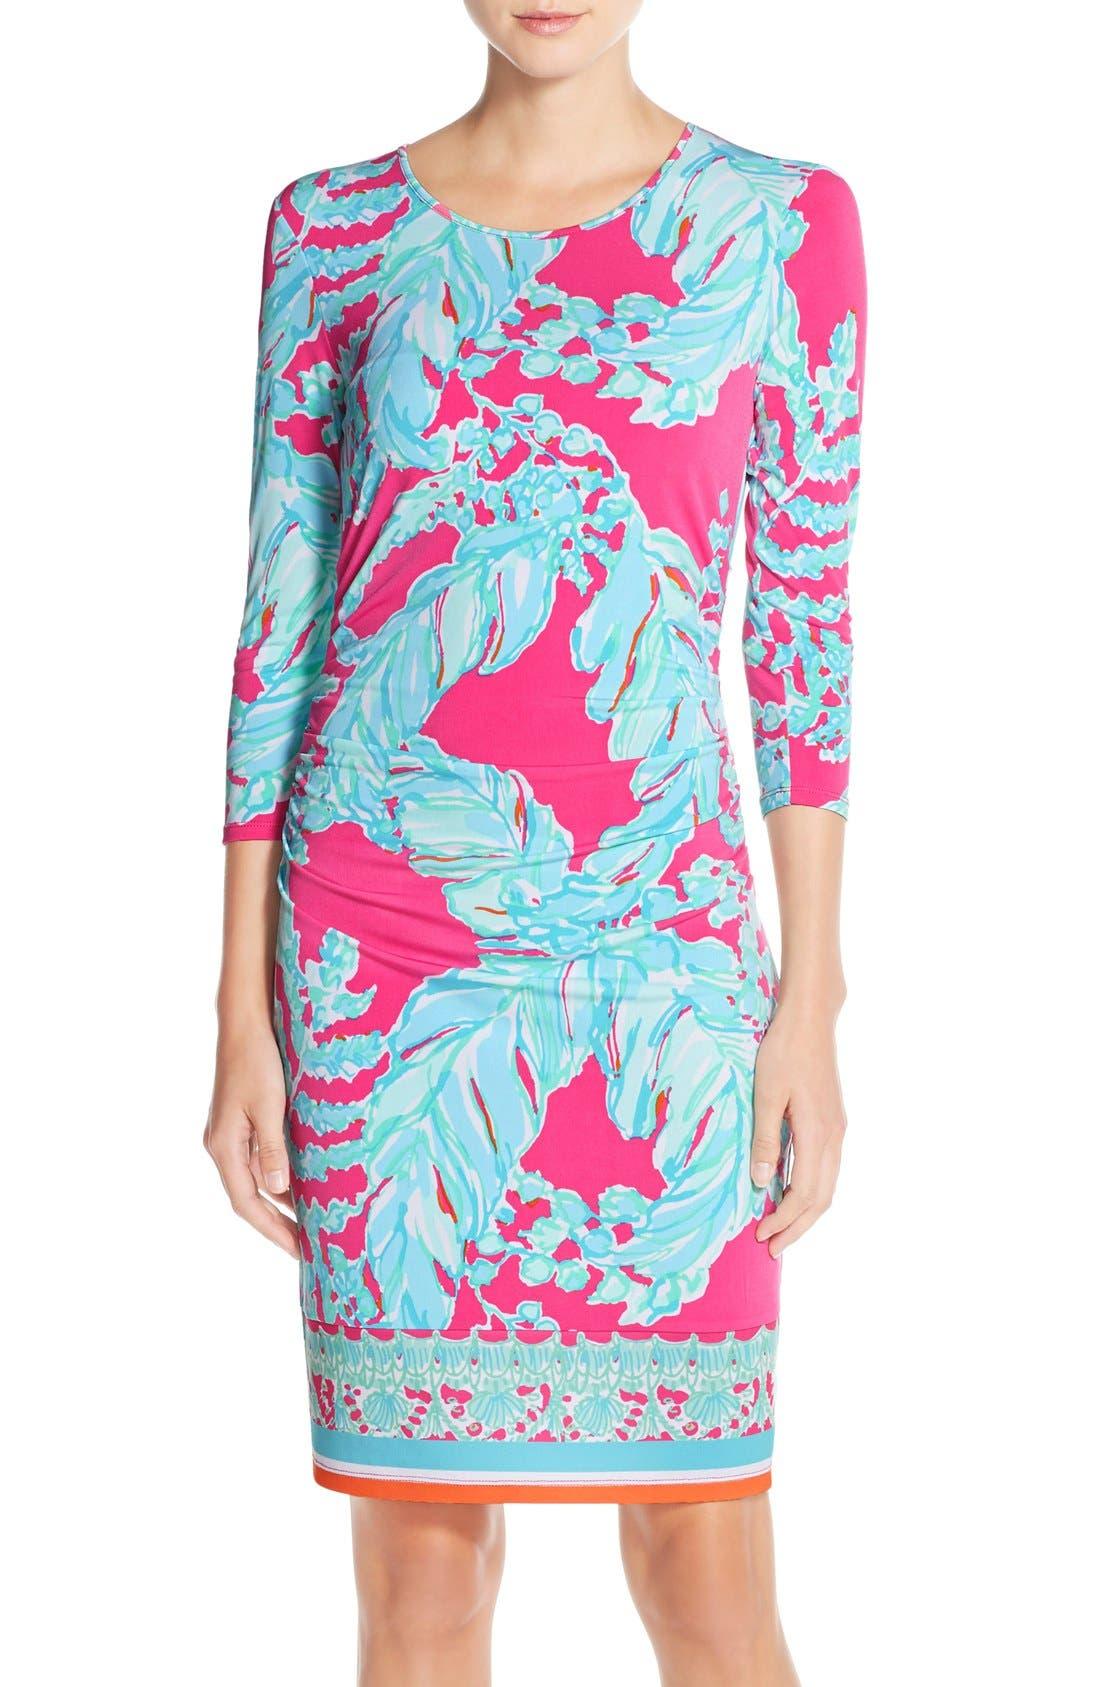 Main Image - Lilly Pulitzer® 'Madison' Ruched Jersey Sheath Dress